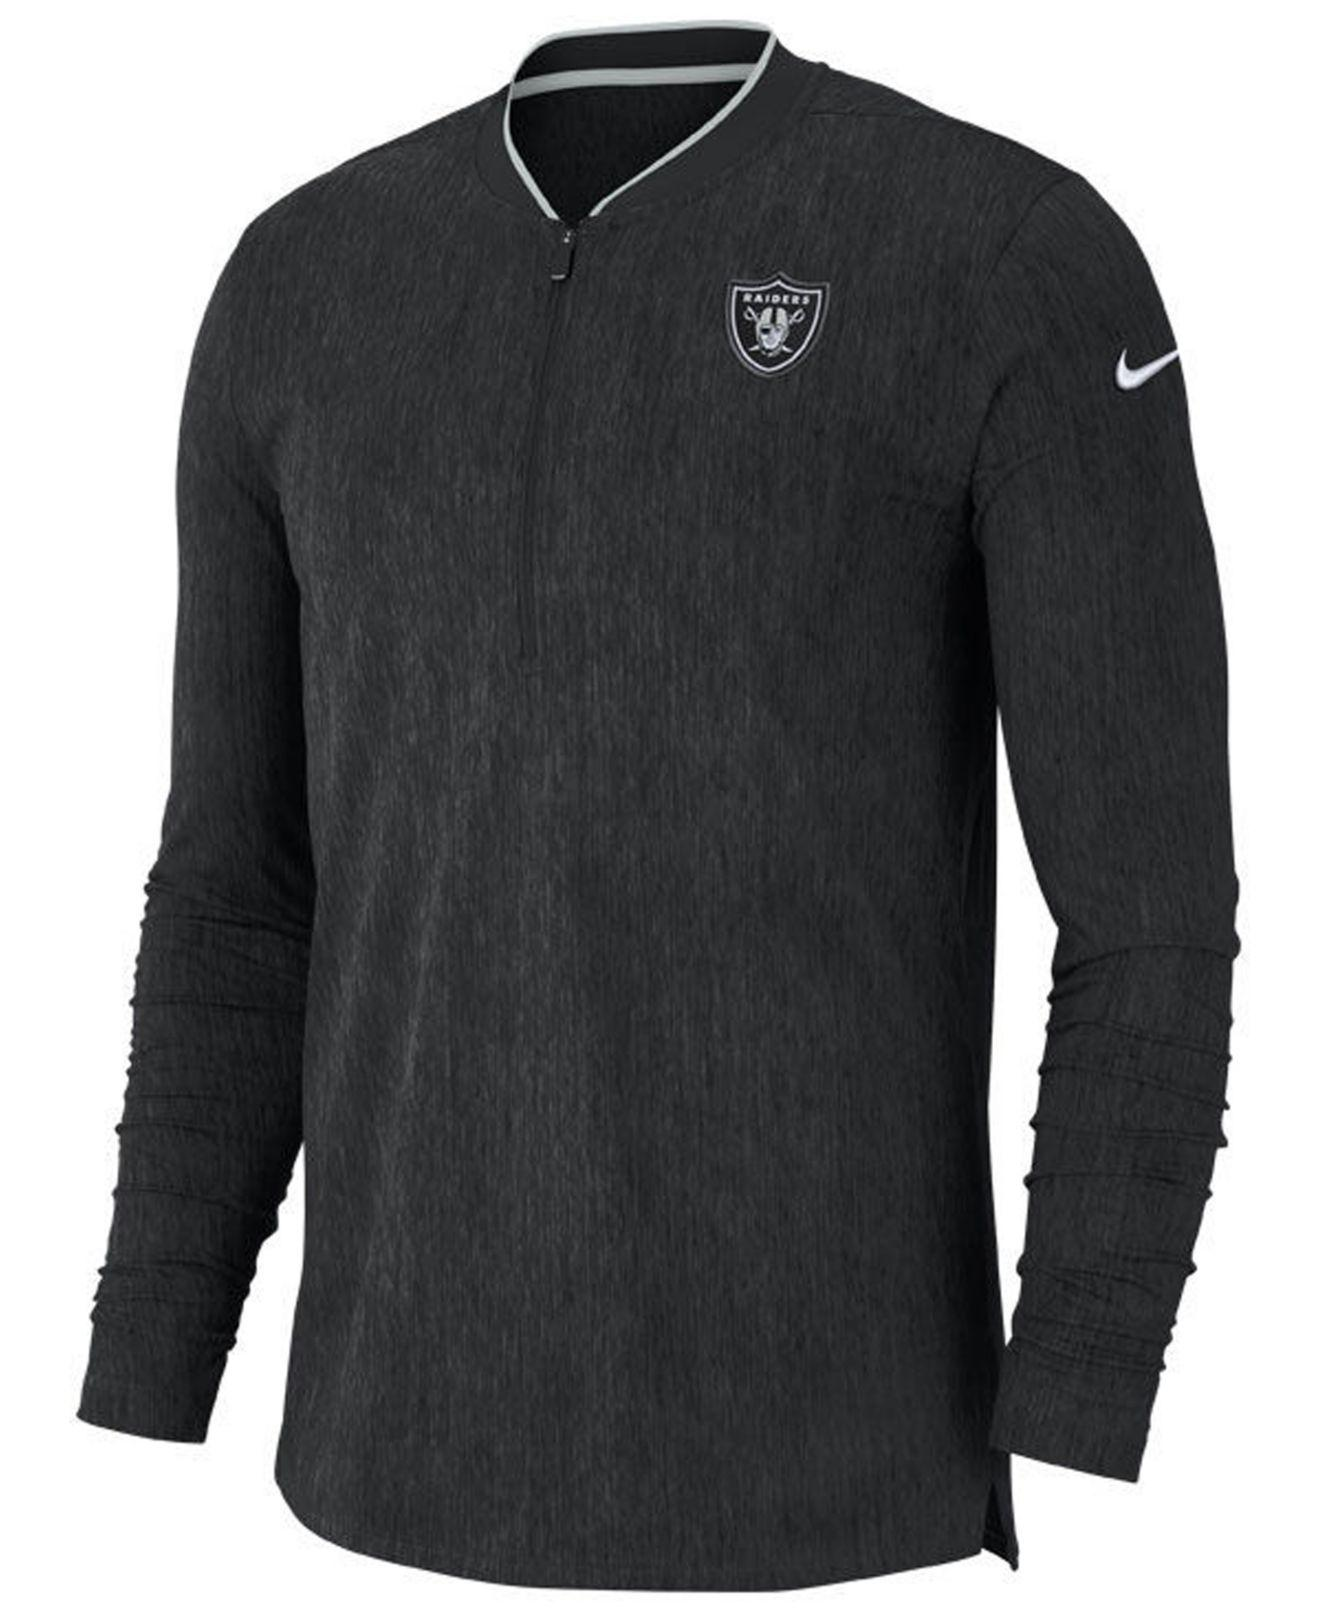 Lyst - Nike Oakland Raiders Coaches Quarter-zip Pullover in Black ... 689440700